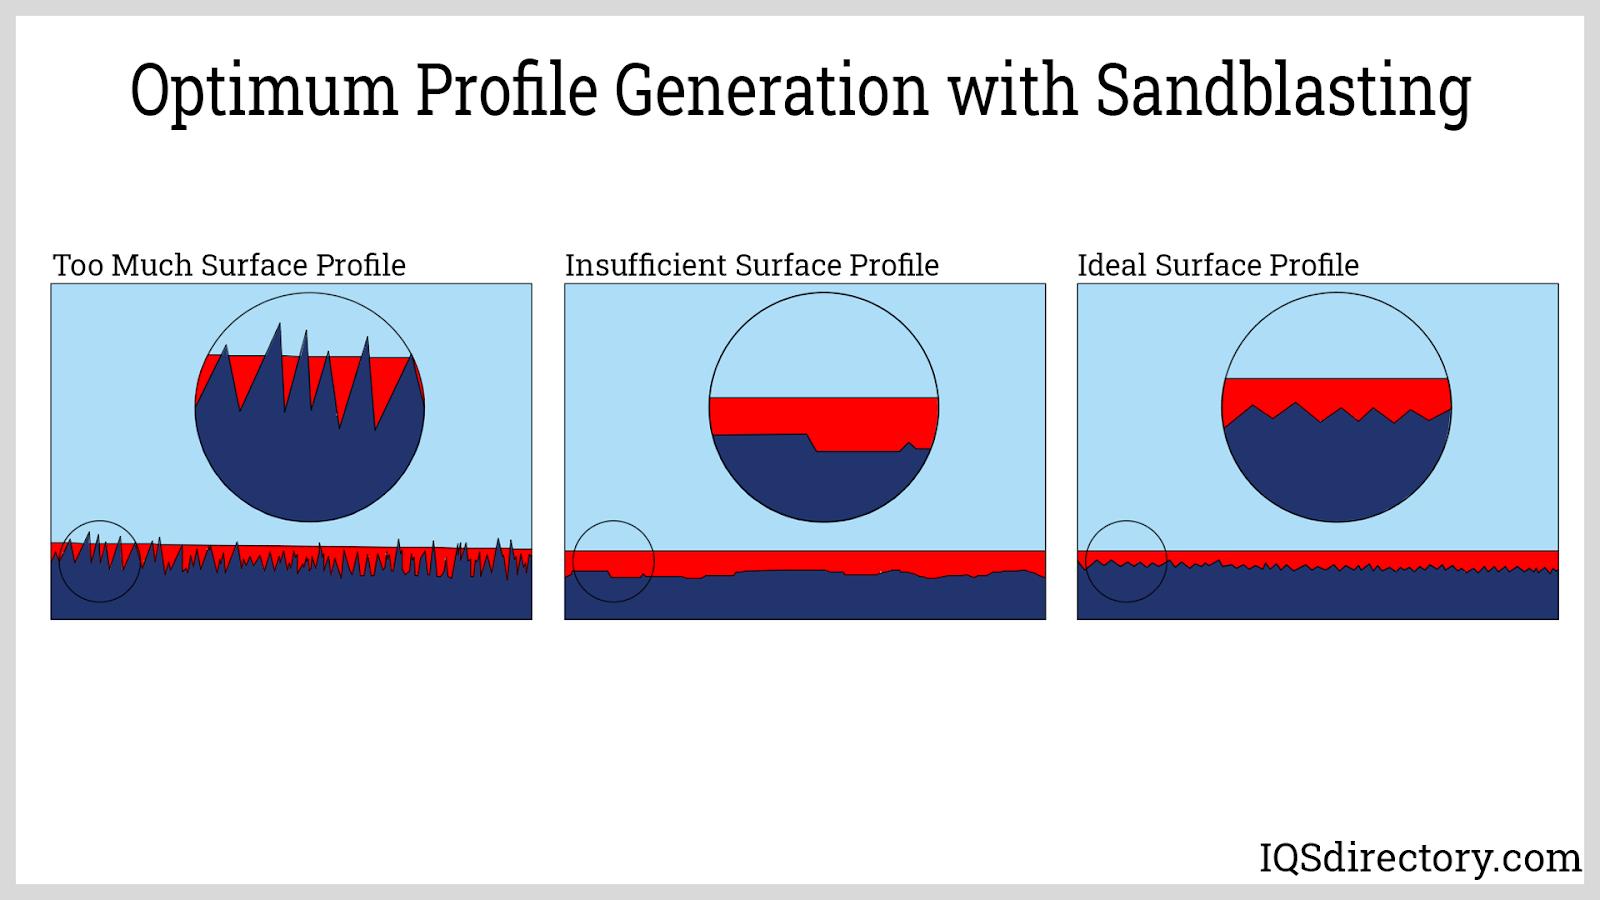 Optimum Profile Generation with Sandblasting